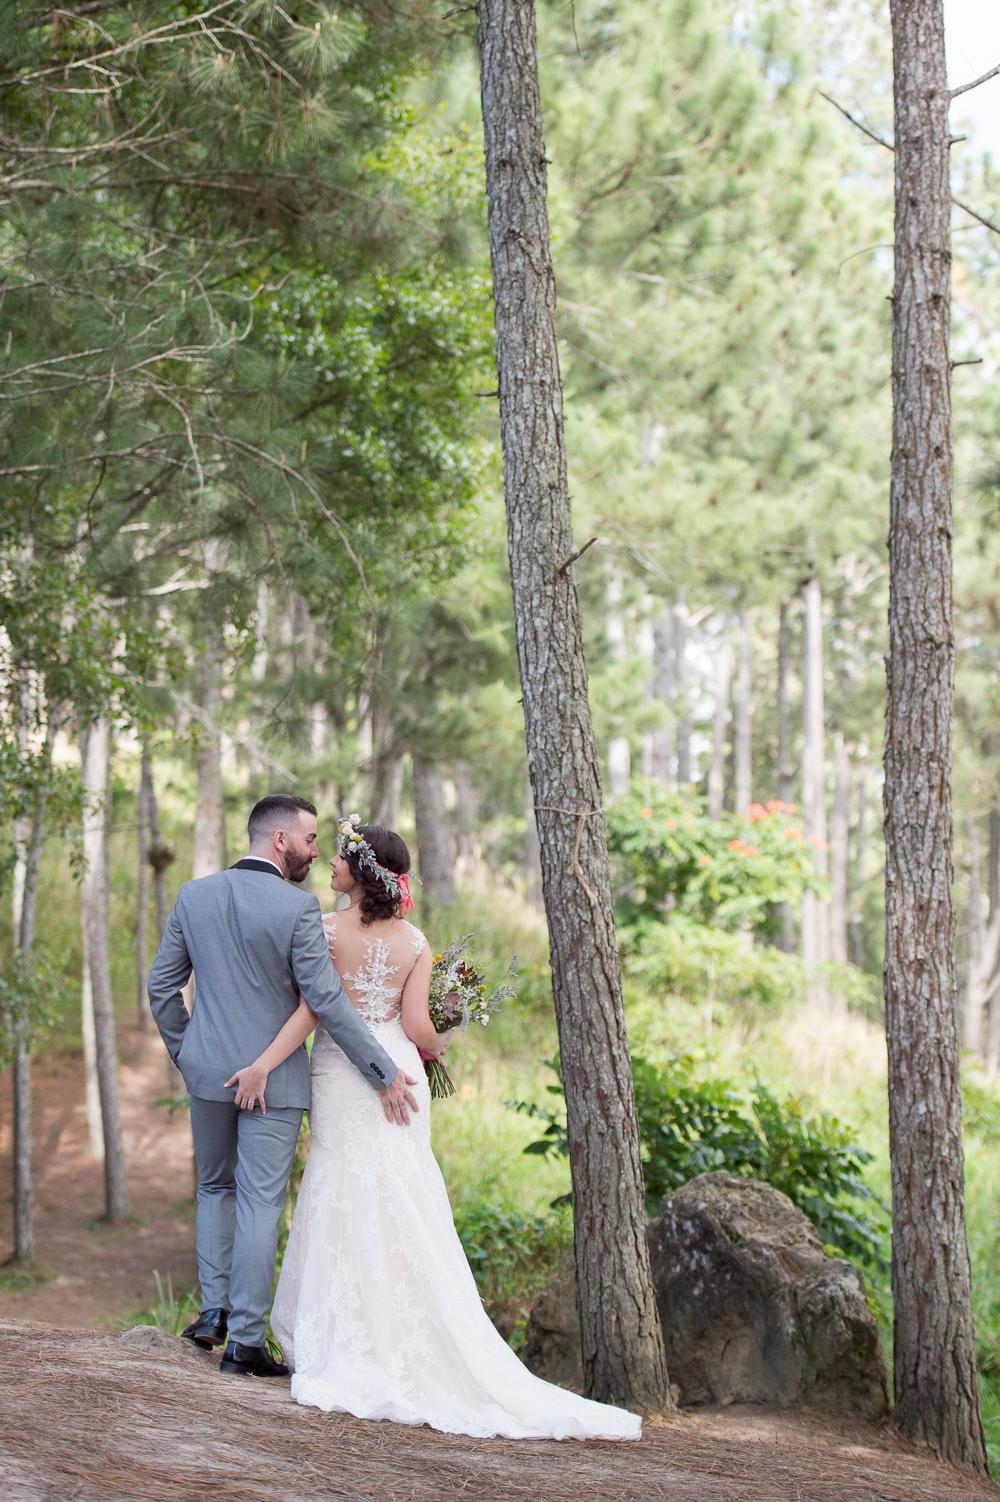 fotografia-bodas-puerto-rico-bosque-pinos-cayey-salinas-14.jpg